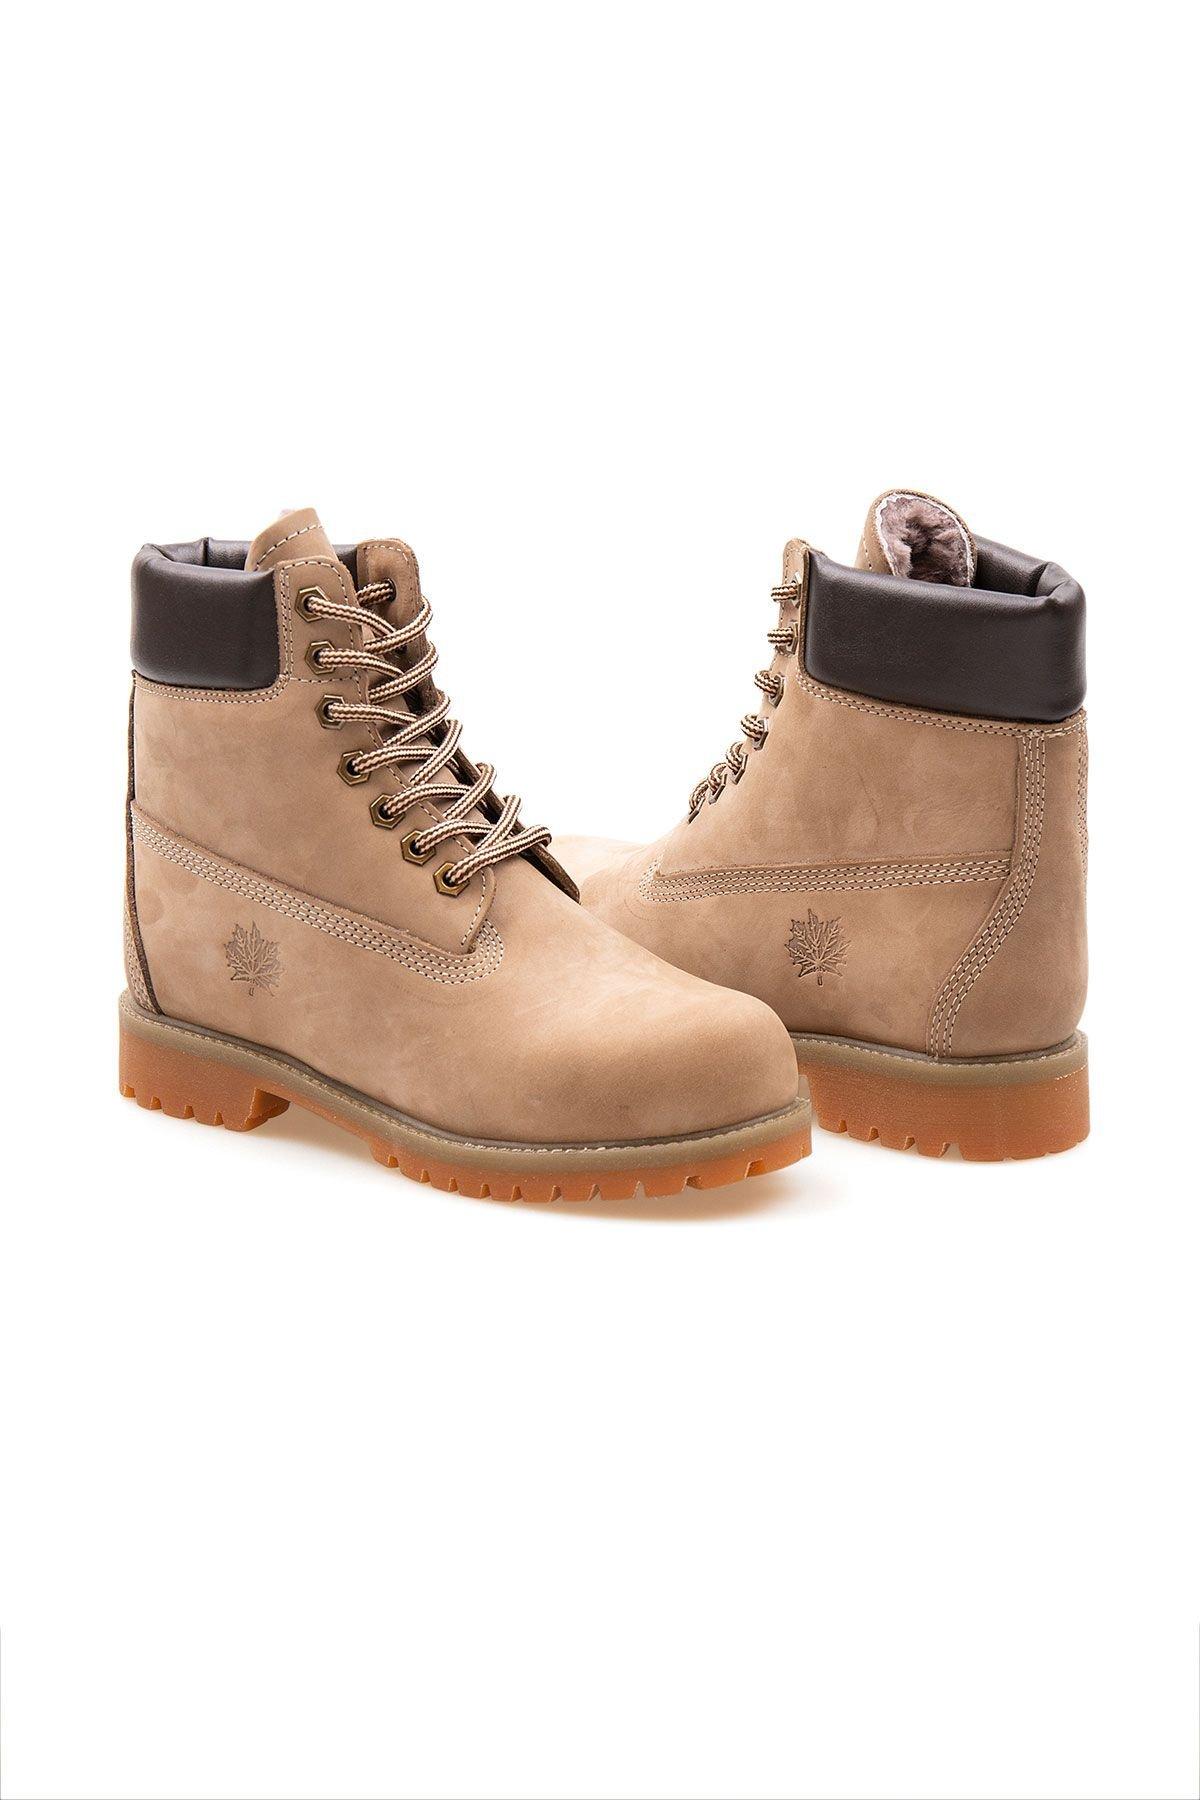 Pegia Genuine Nubuck Men's Boots 500900 Sand-colored